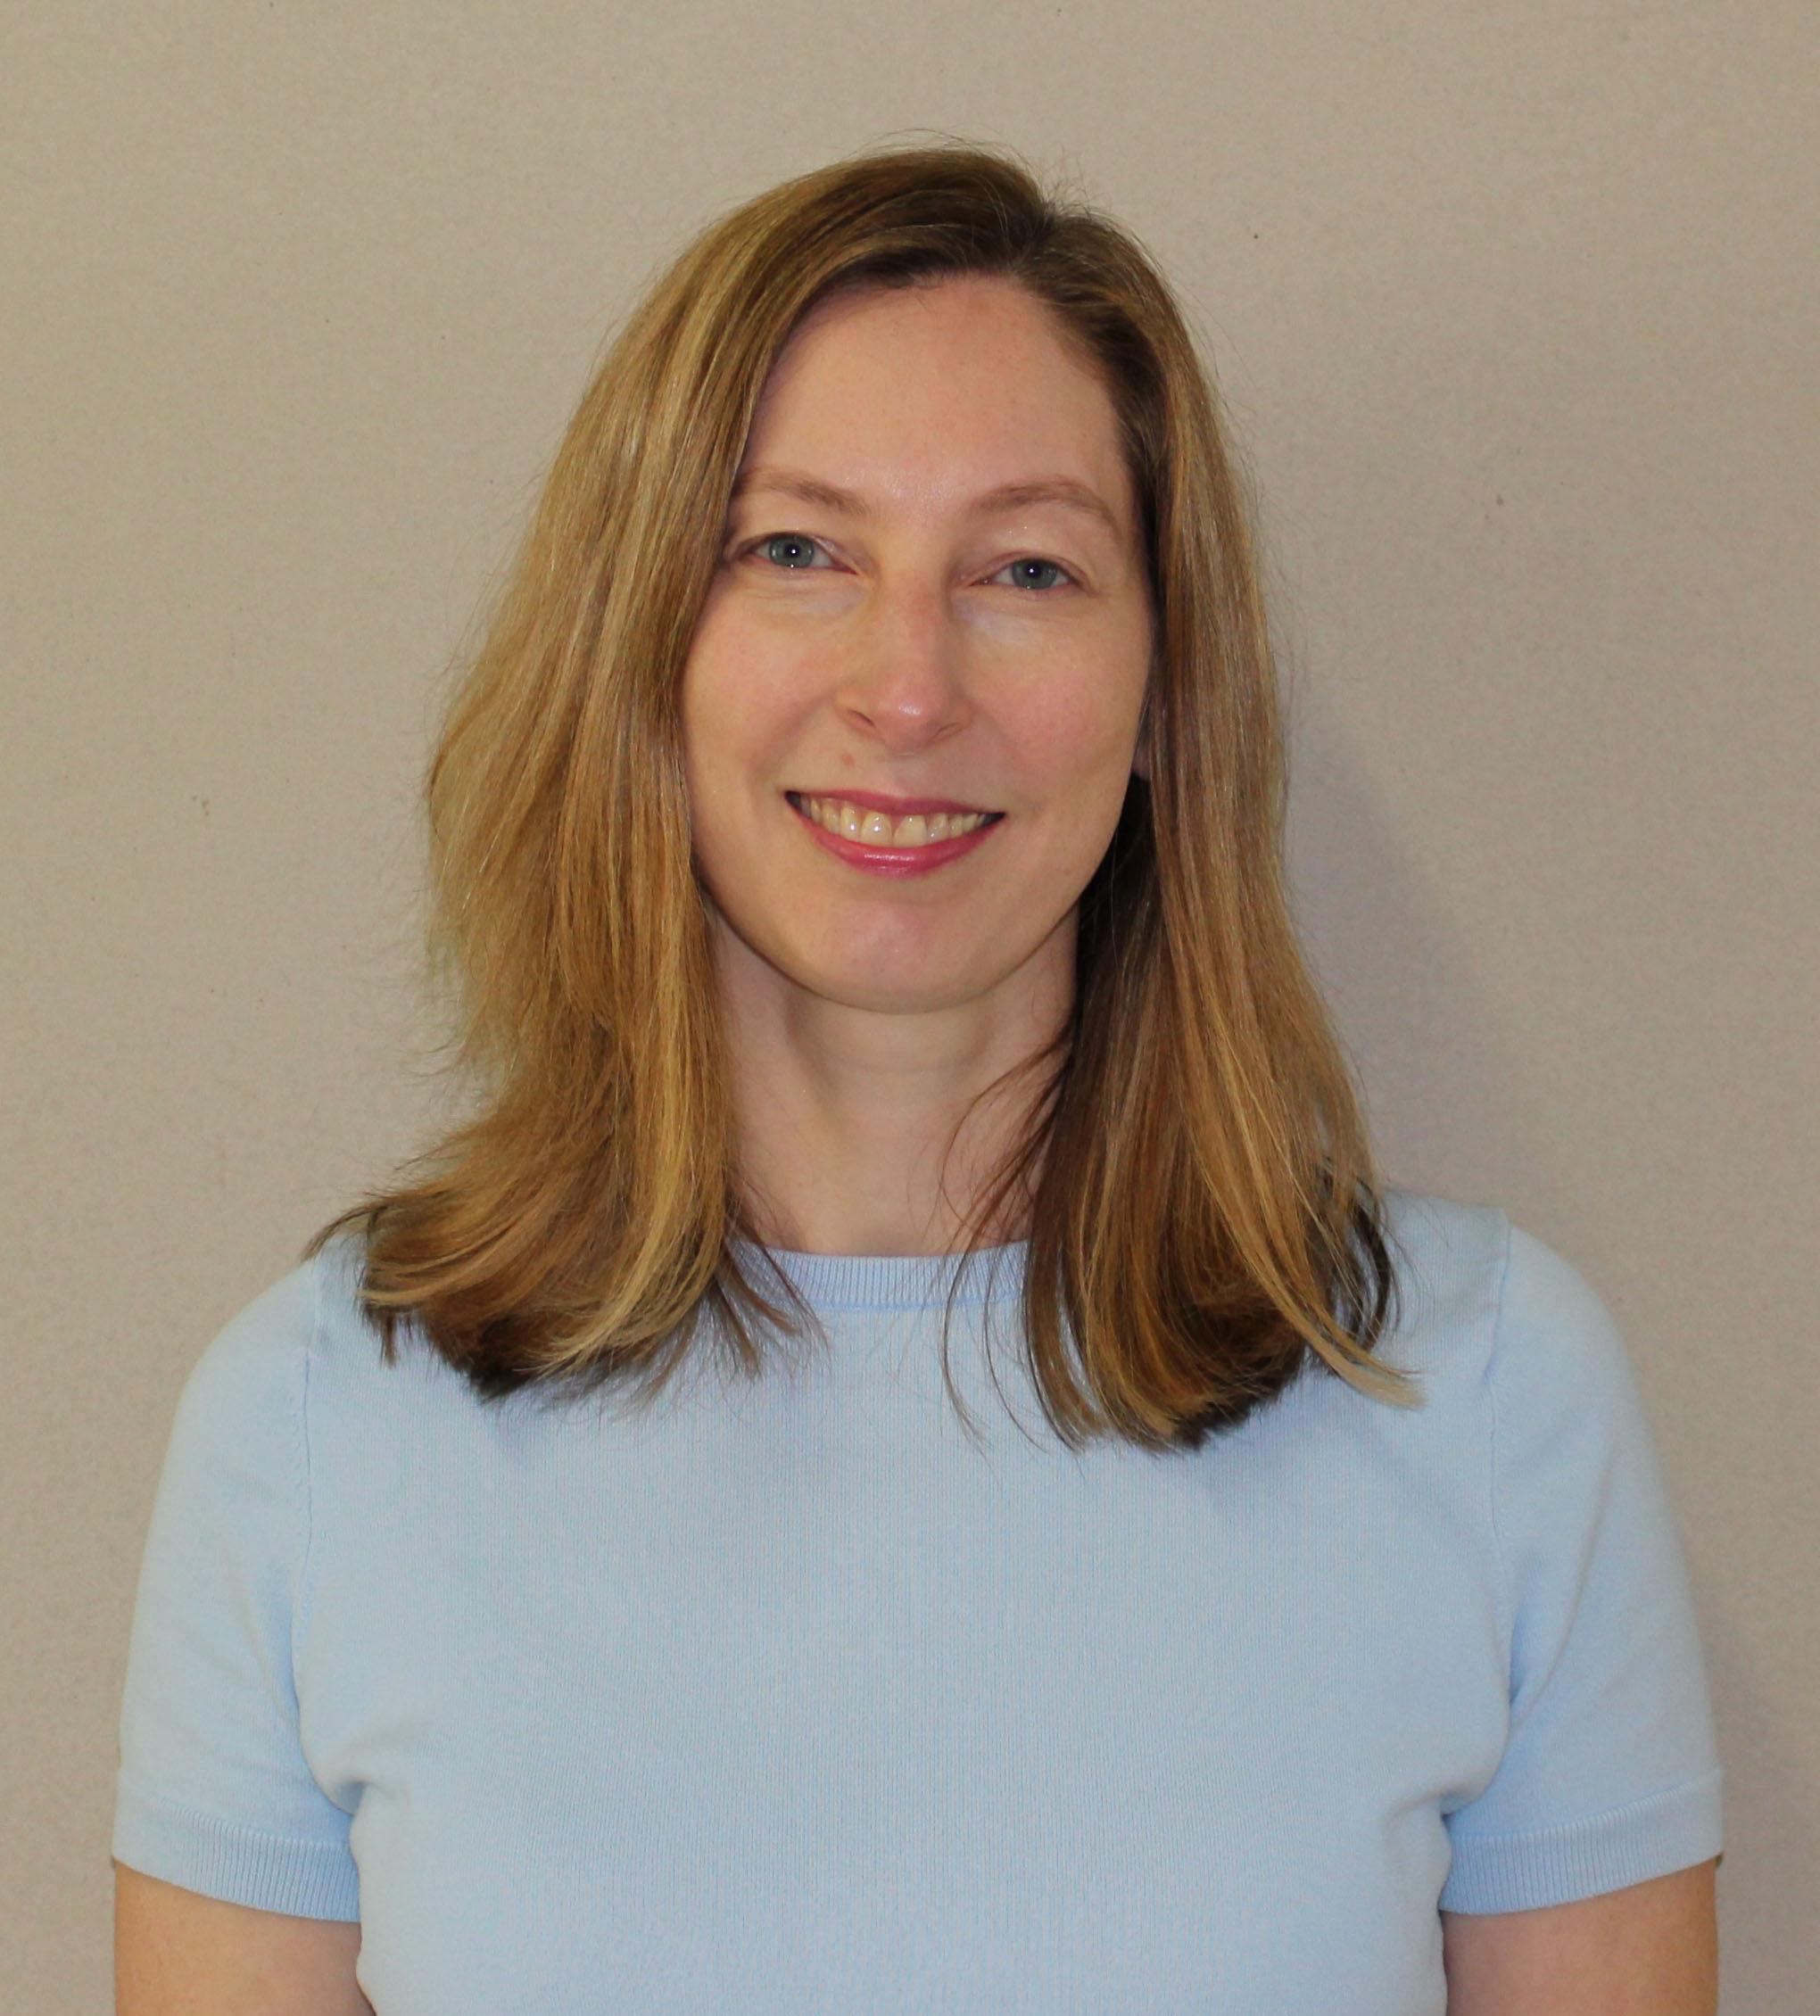 Headshot of Dr. Beth Weaver